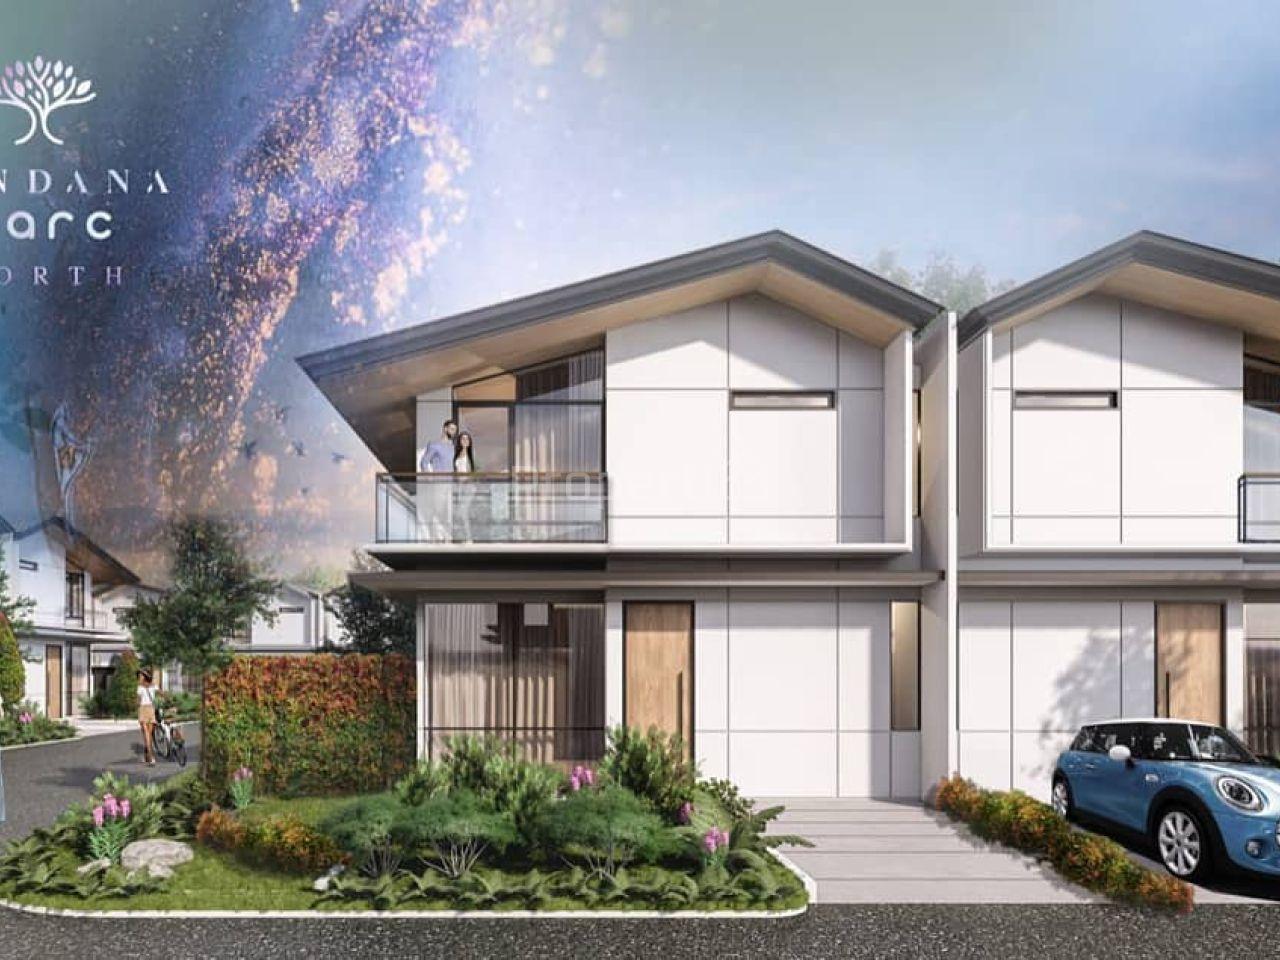 New House at Cendana Parc North, Lippo Karawaci, Banten